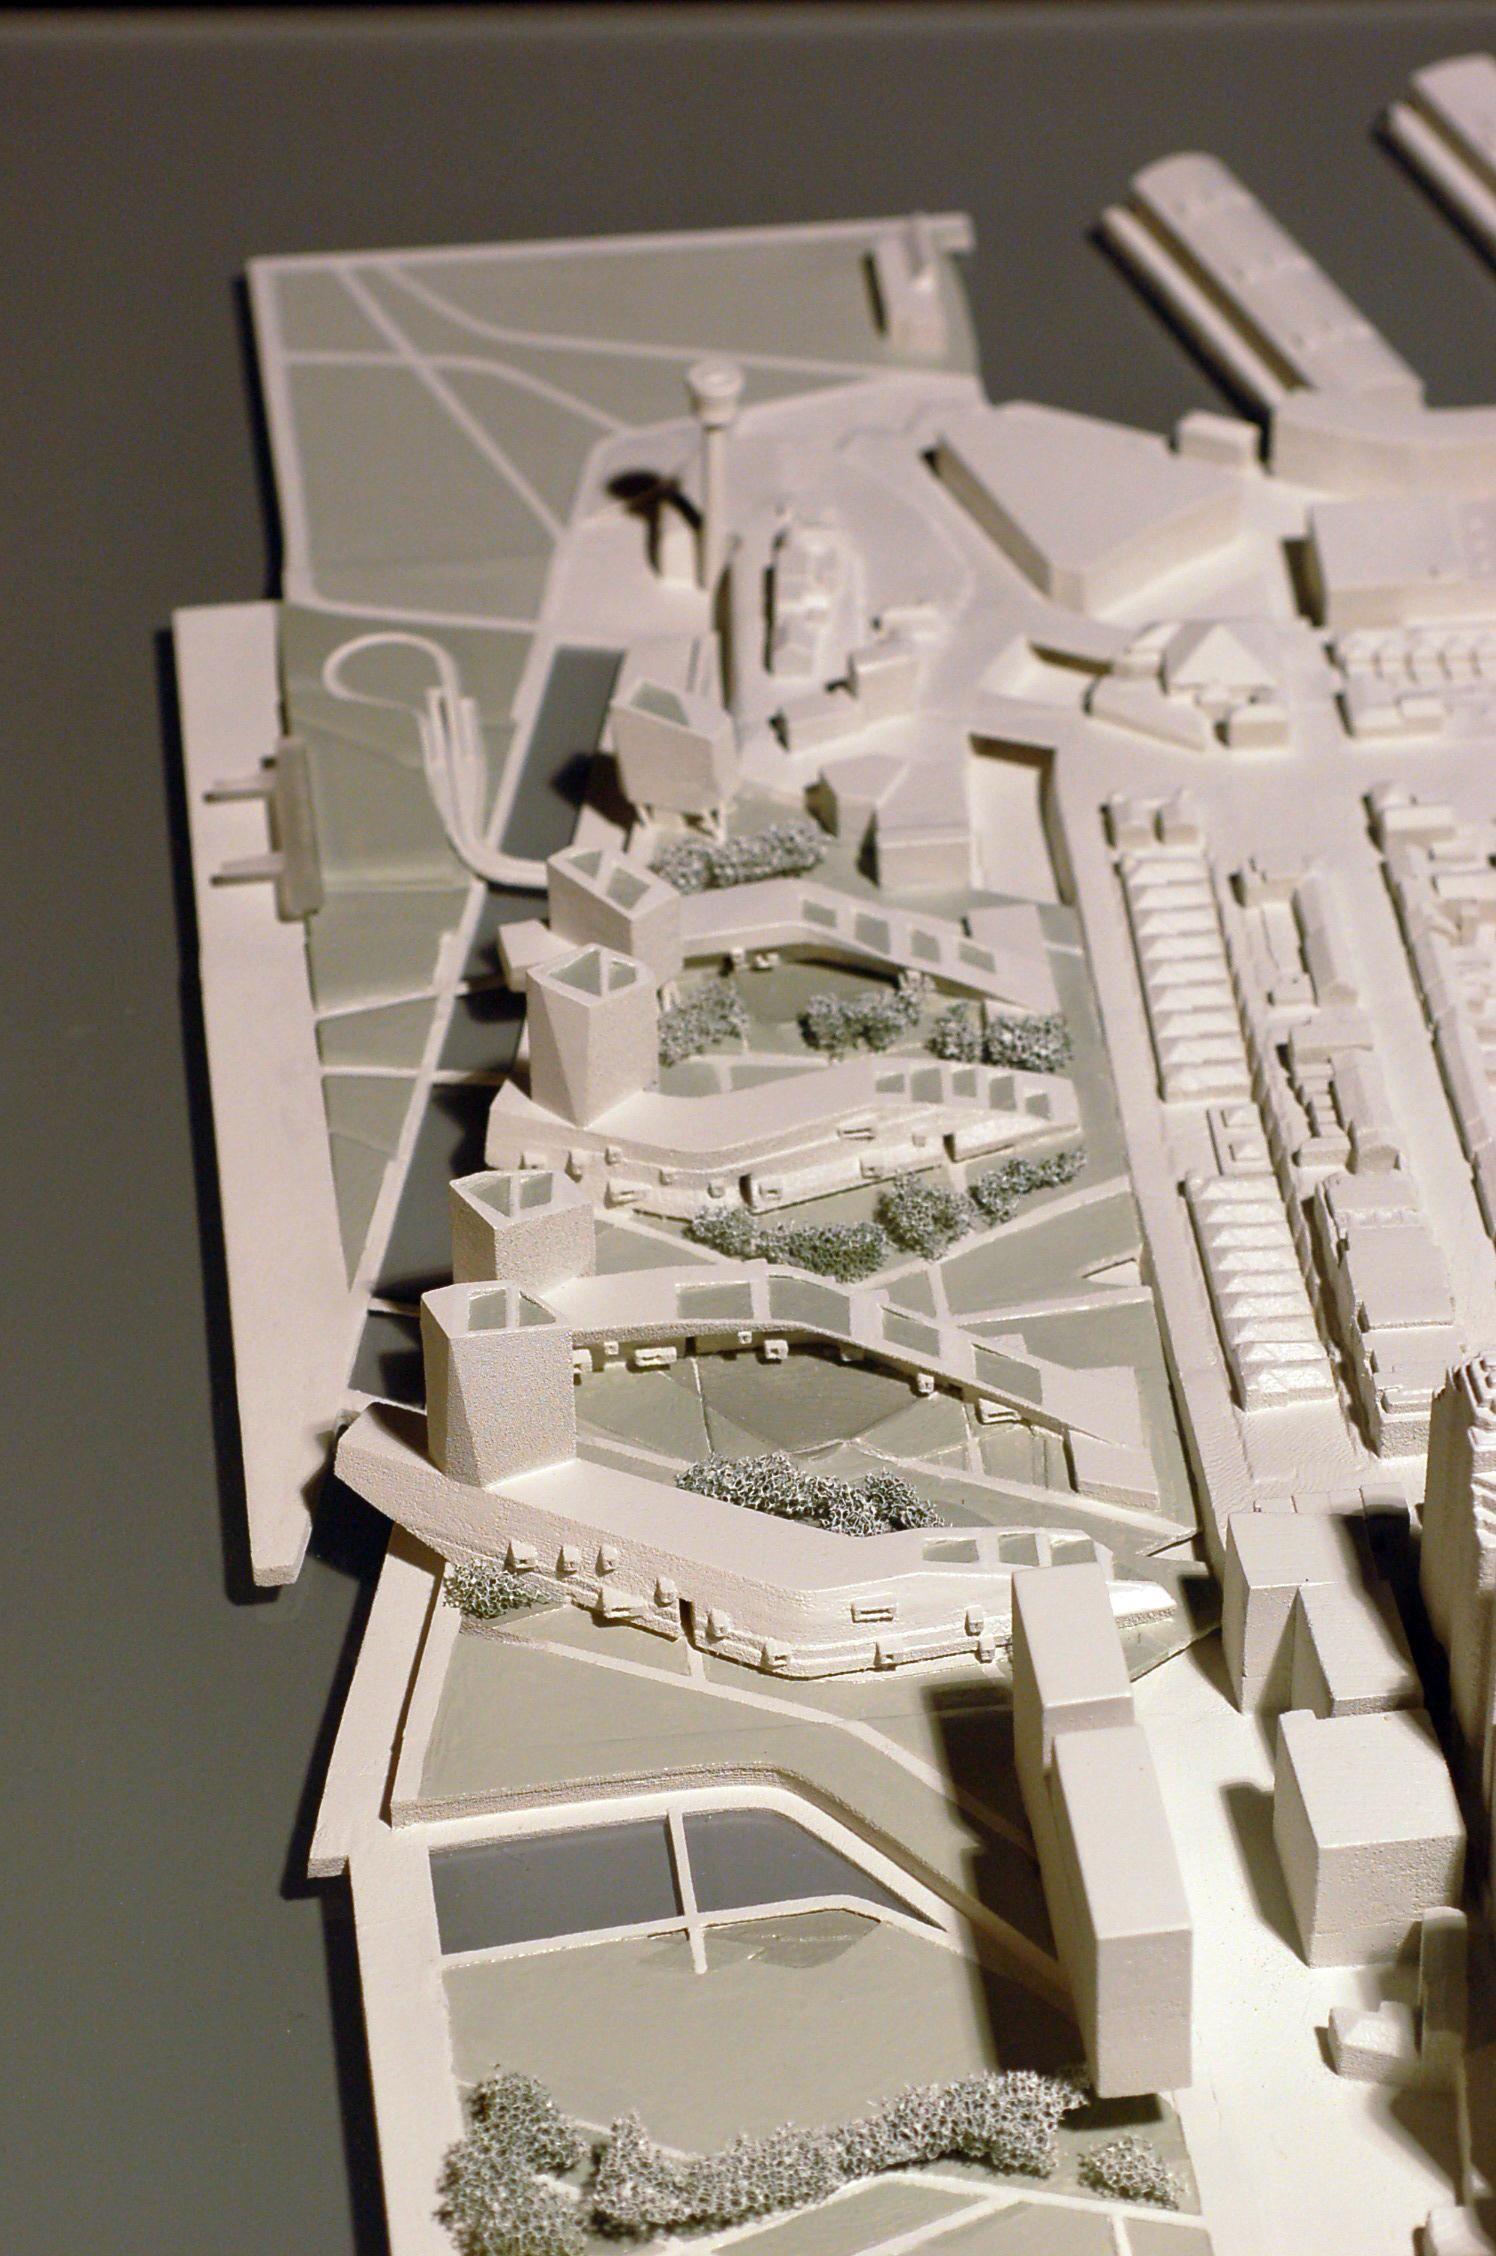 Morphosis Model Bjorn Buckley: Architecture Model Making